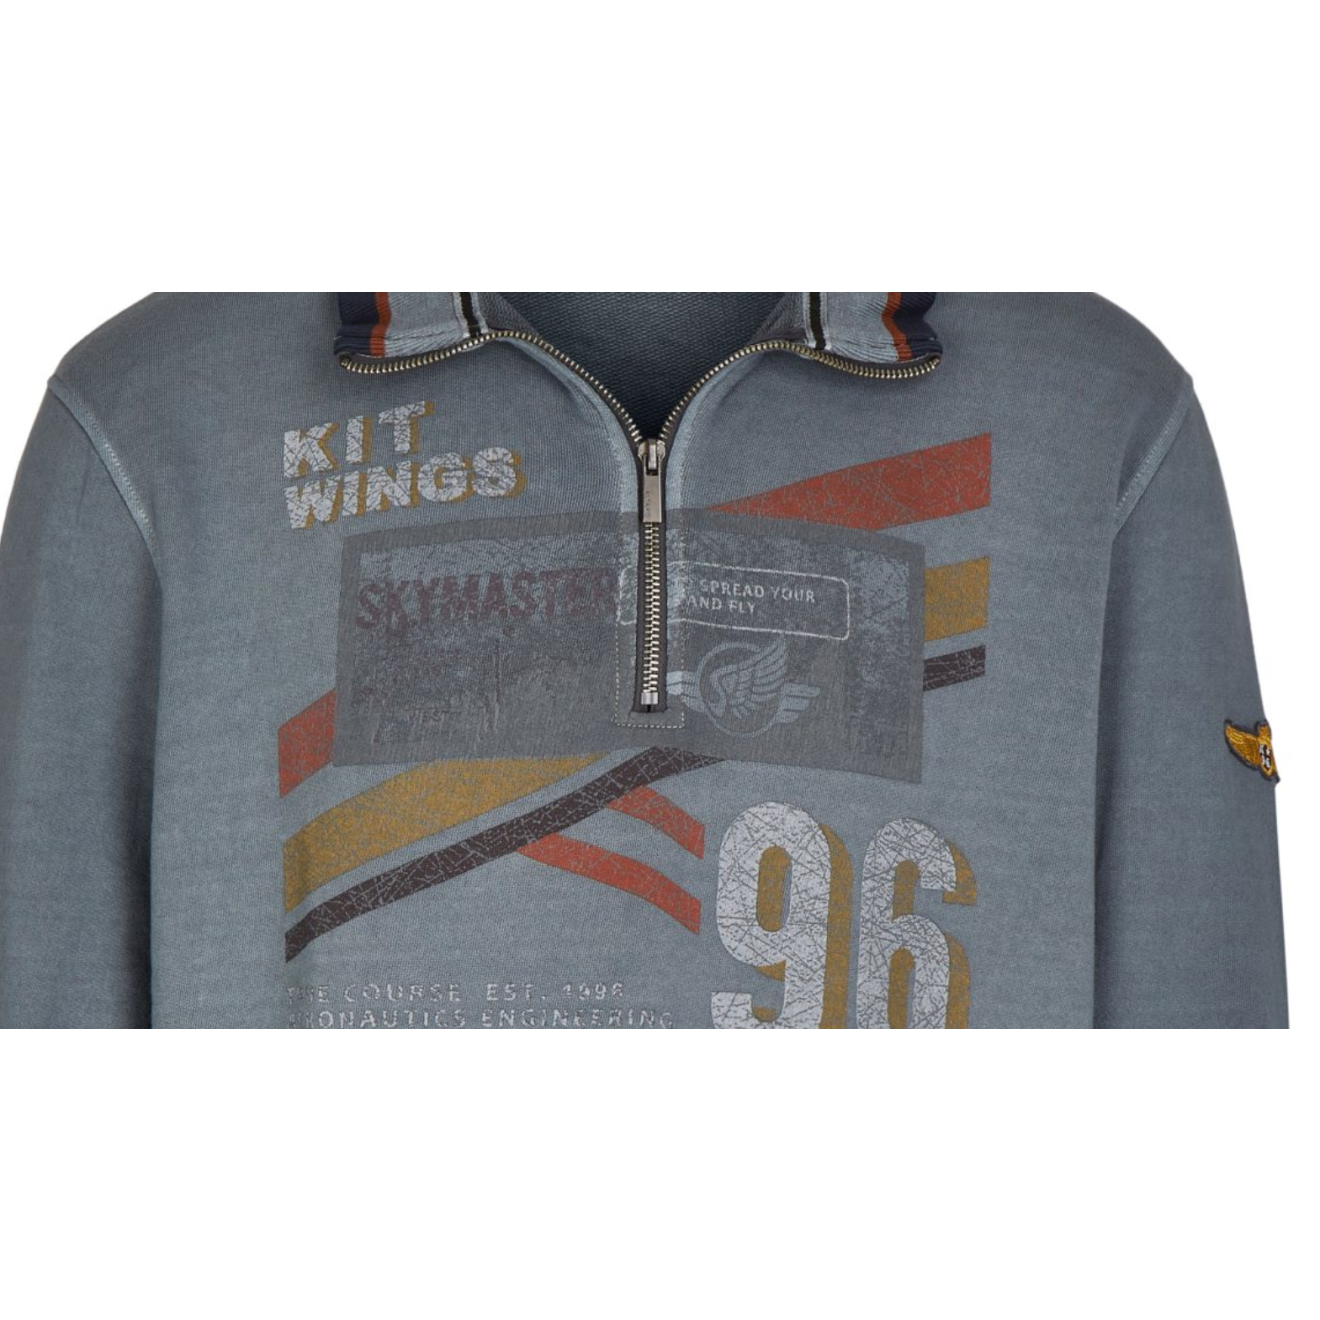 Kitaro Hoody Sweatshirt Shirt Kapuzenpullover Herren Langarm Grau Größe XL XXL